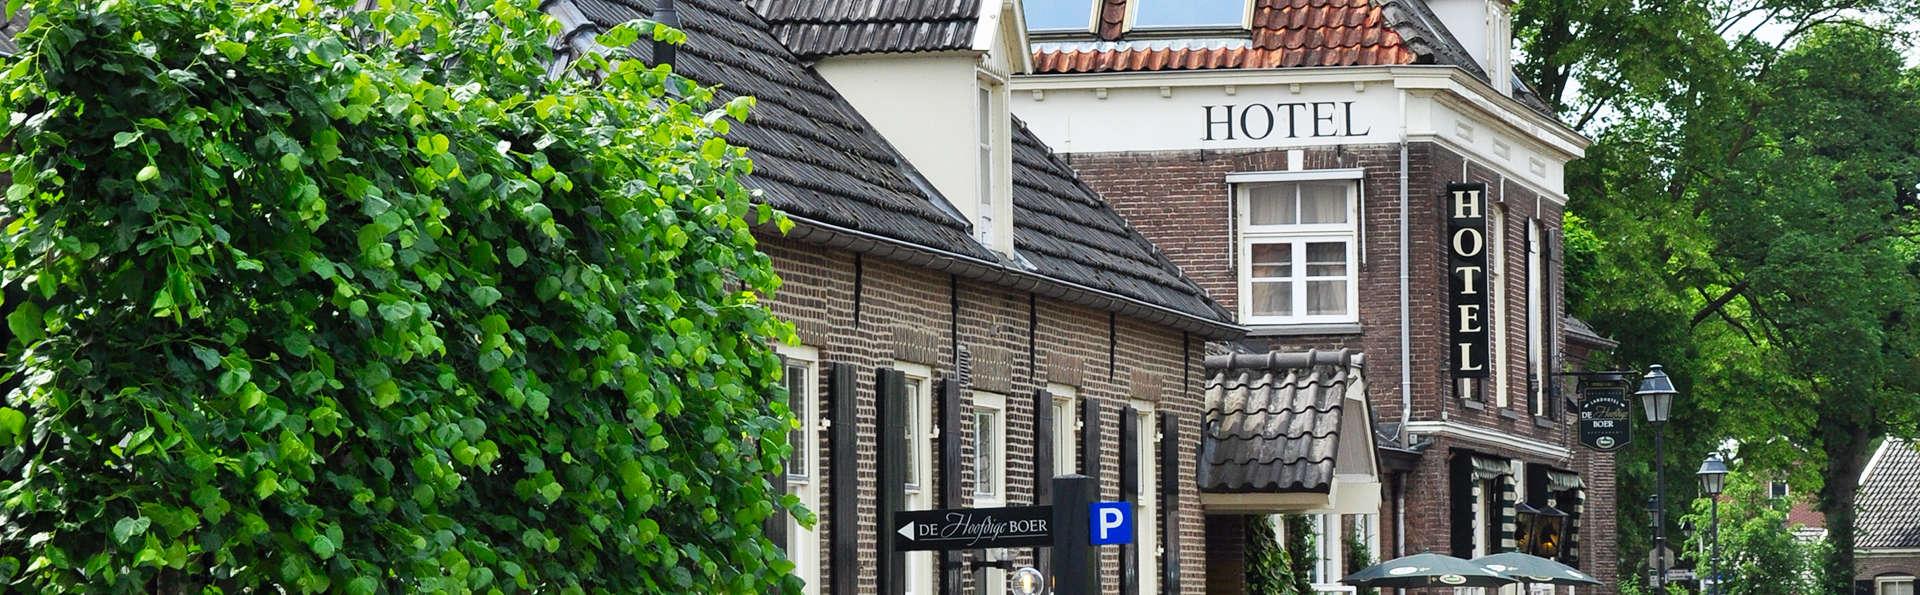 Landhotel De Hoofdige Boer - EDIT_NEW_front.jpg